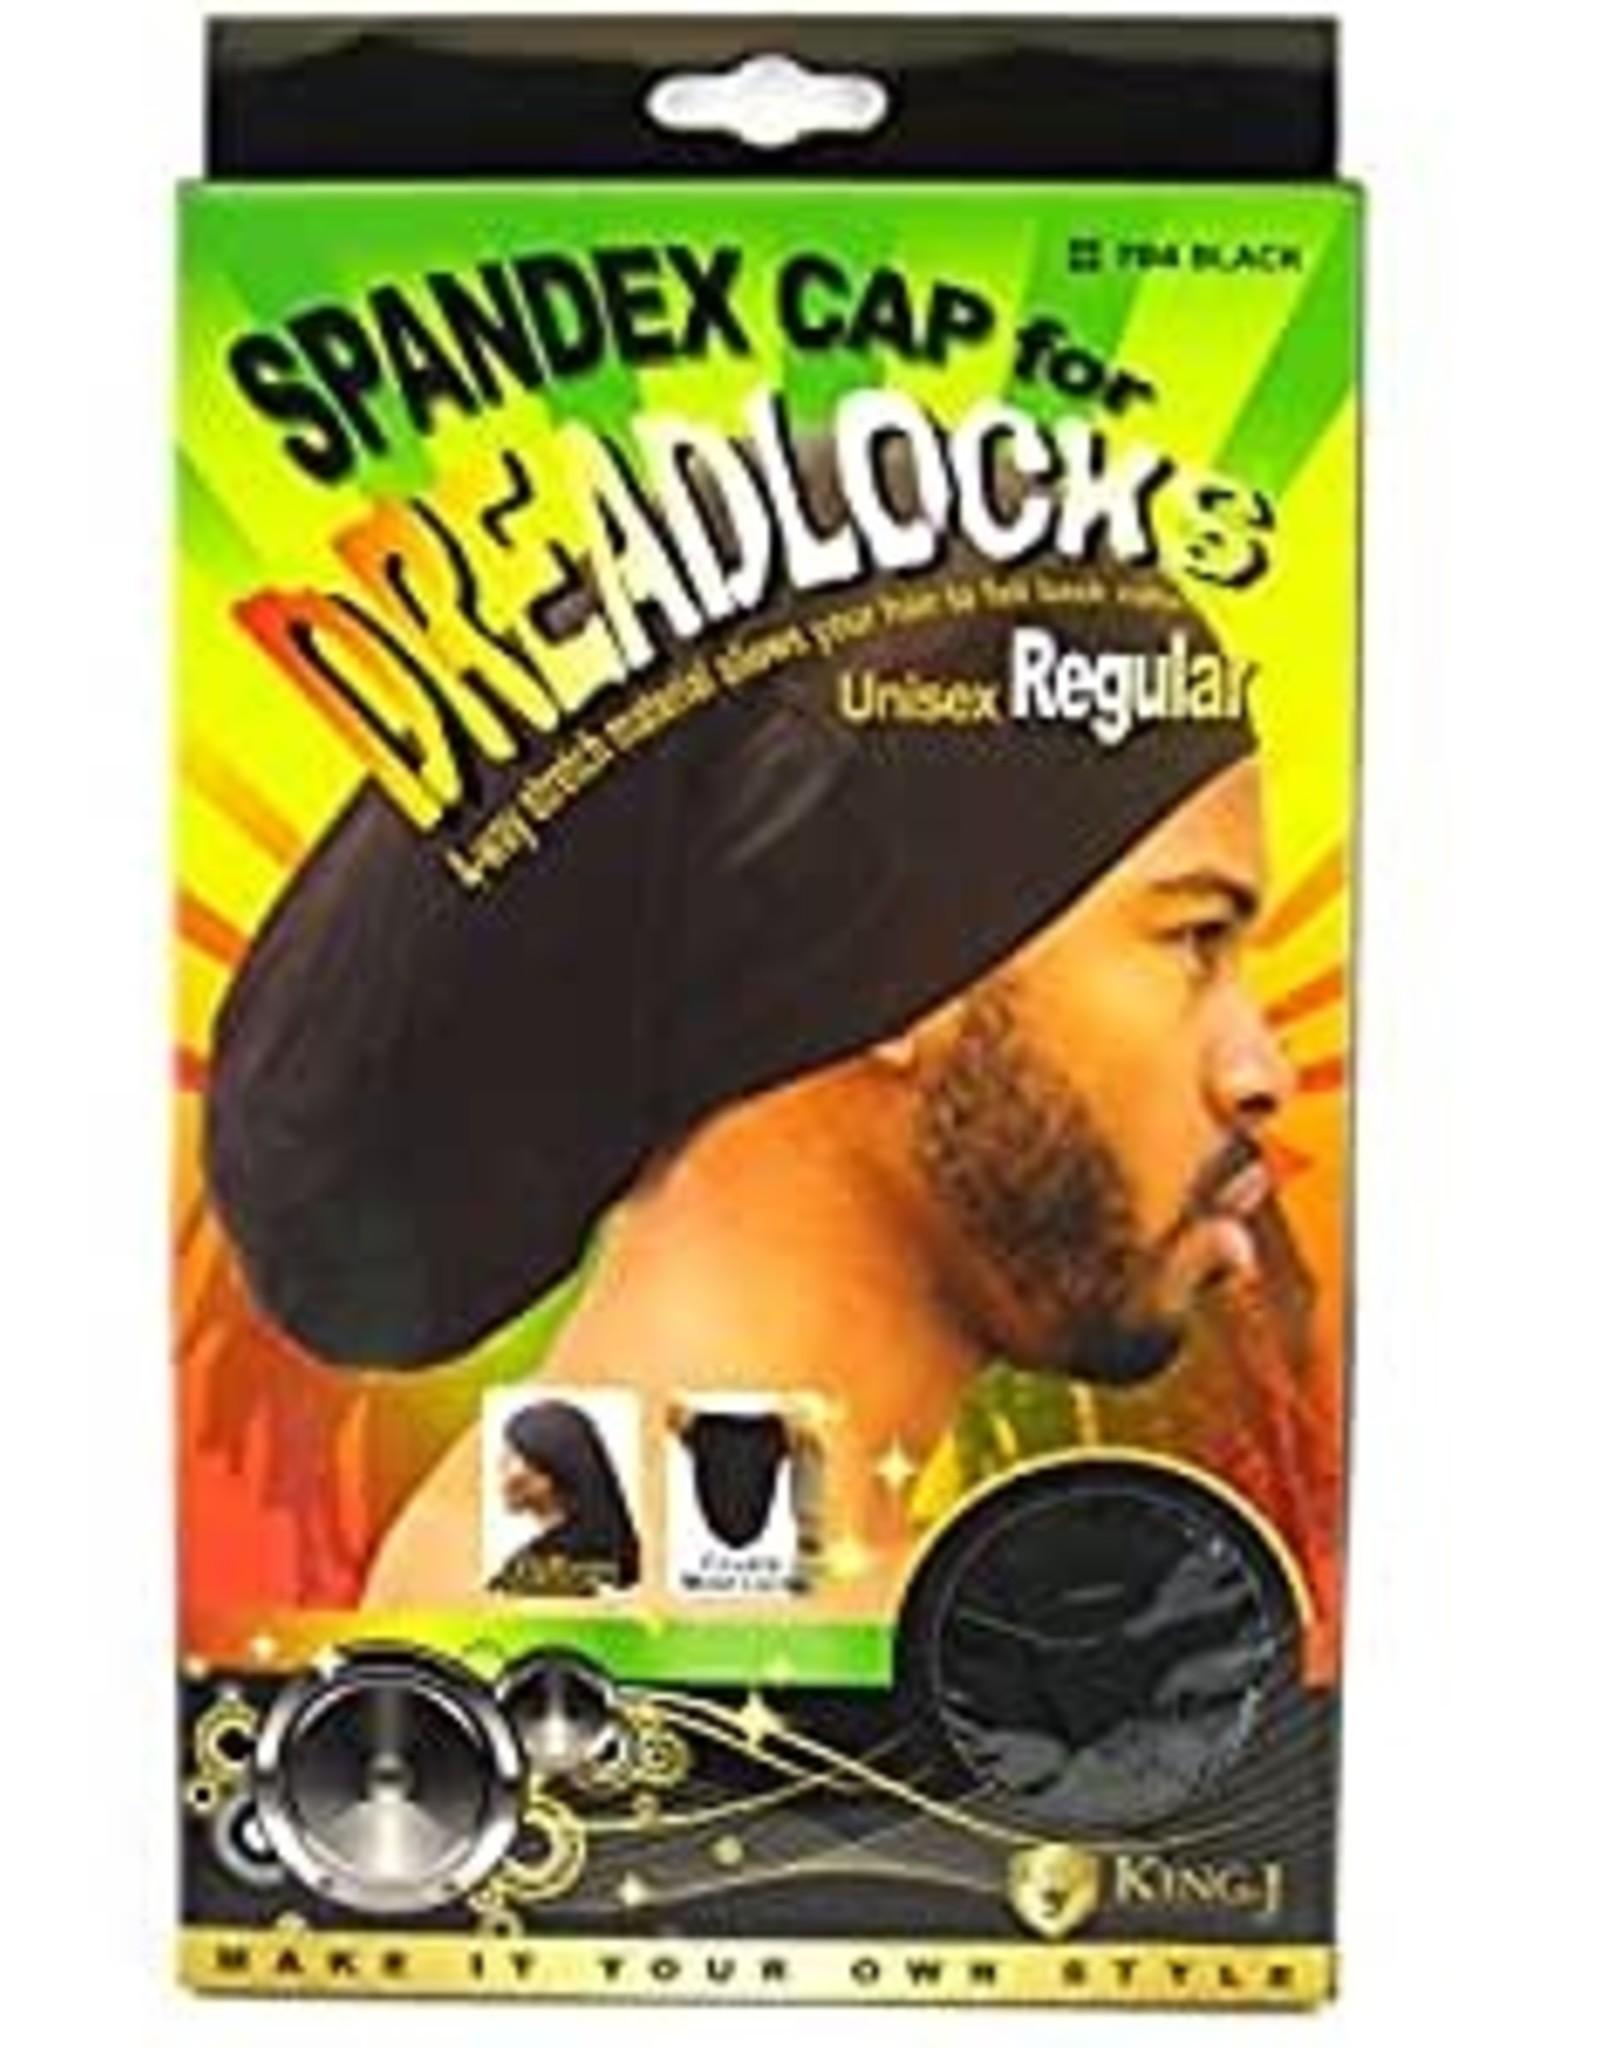 KING J SPANDEX DREADLOCKS CAP